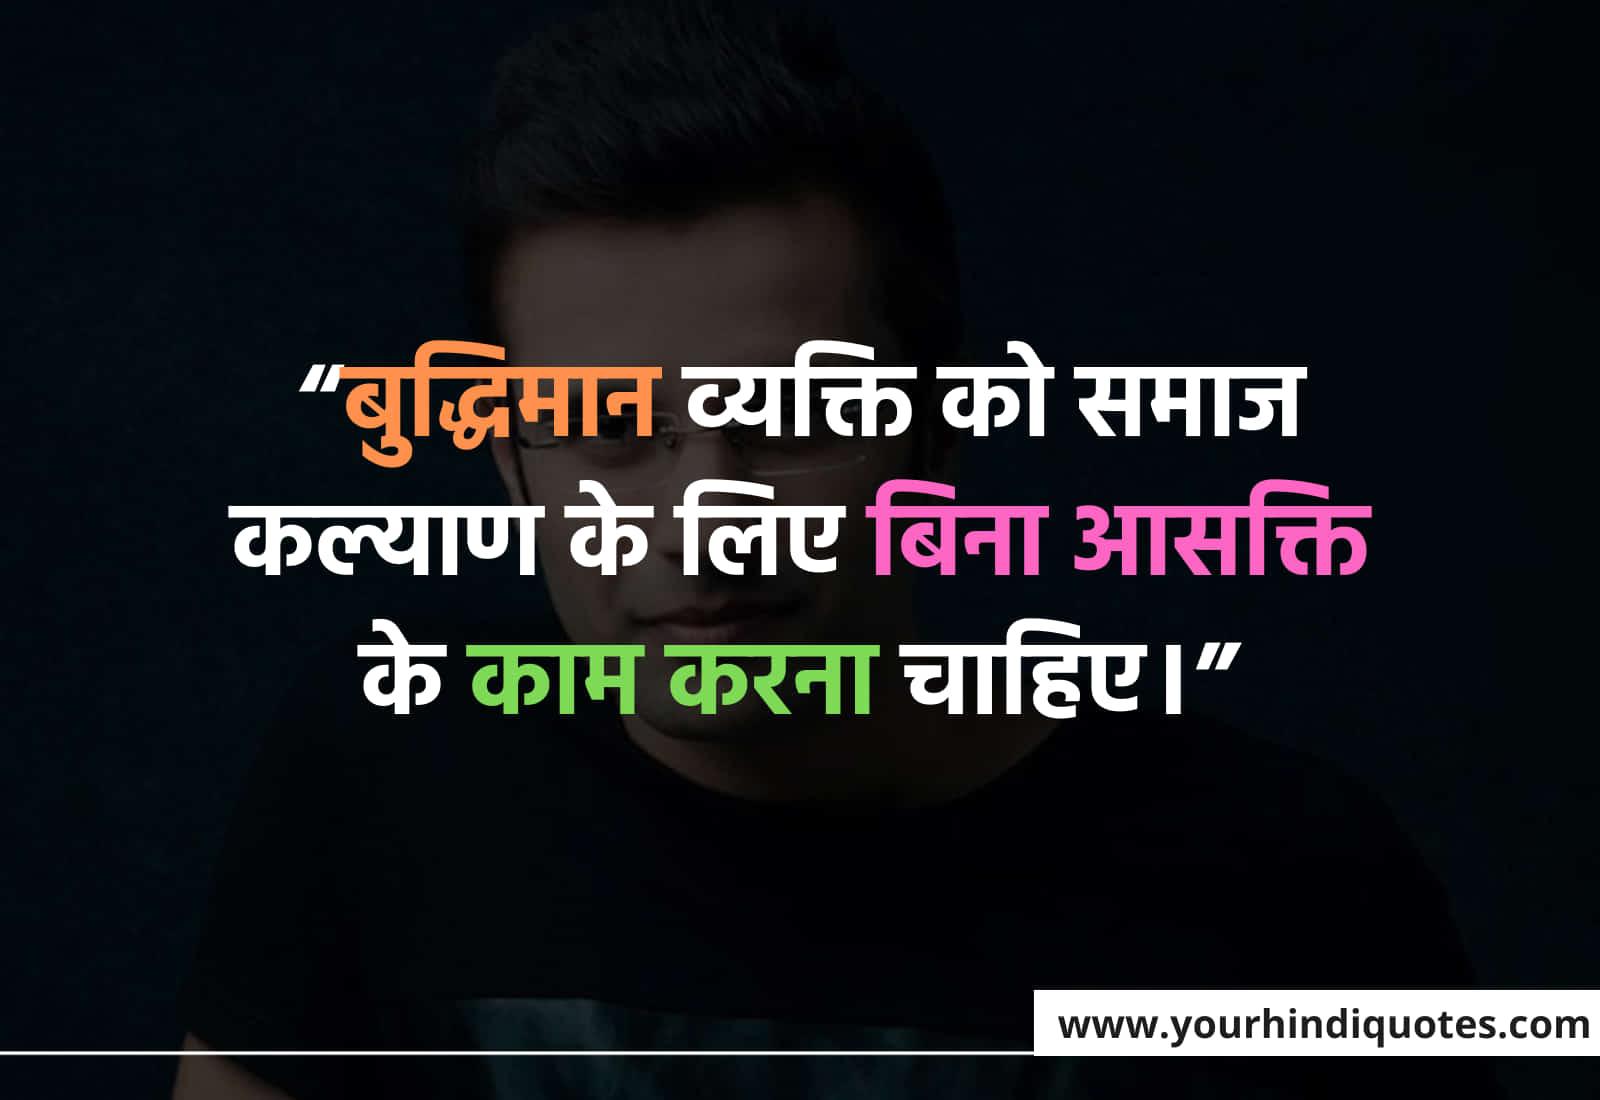 Life Quotes From Bhagwat Gita In Hindi